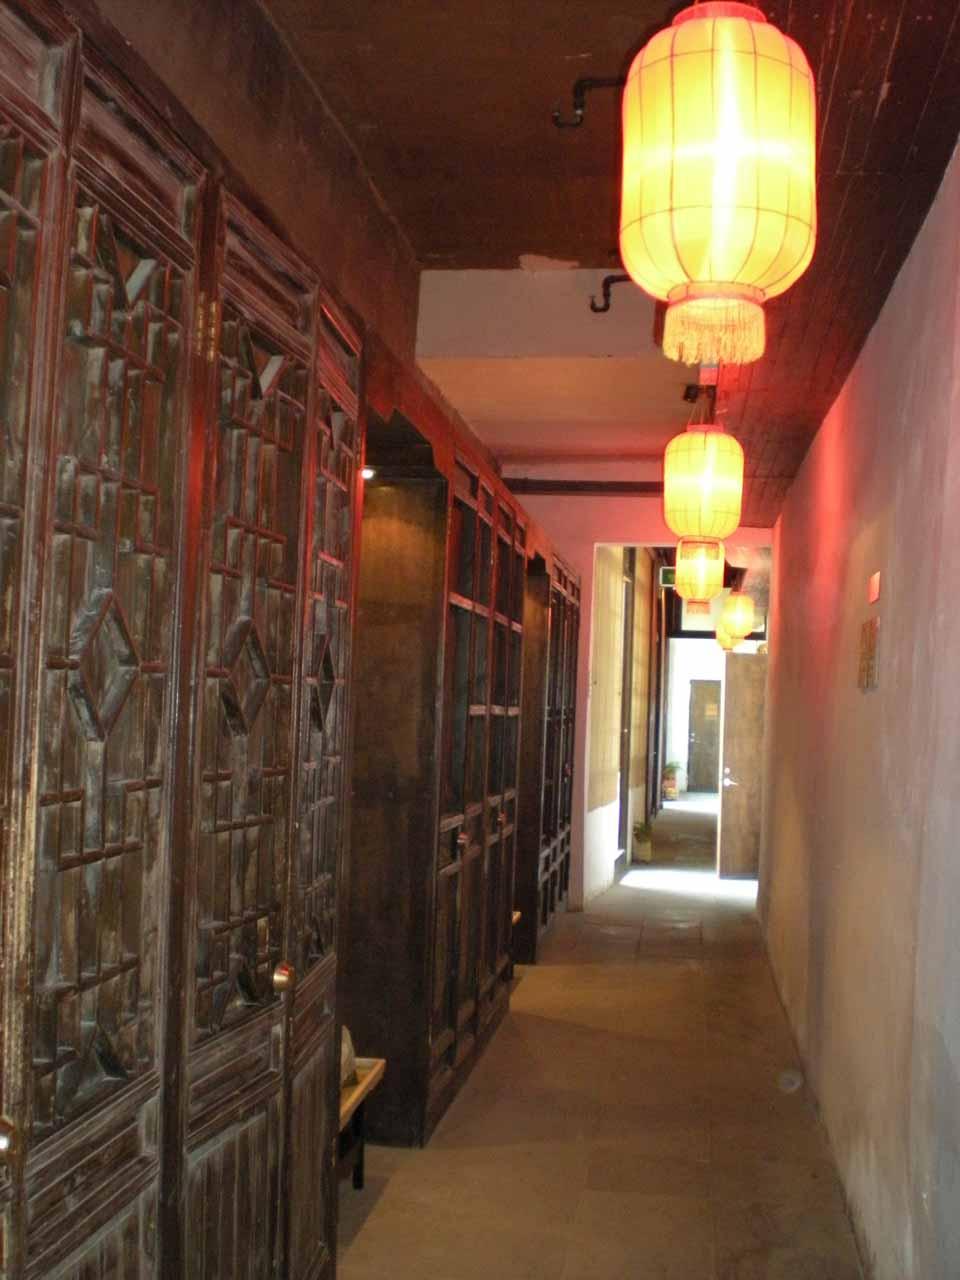 Walking the corridors of the Suzhou accommodation